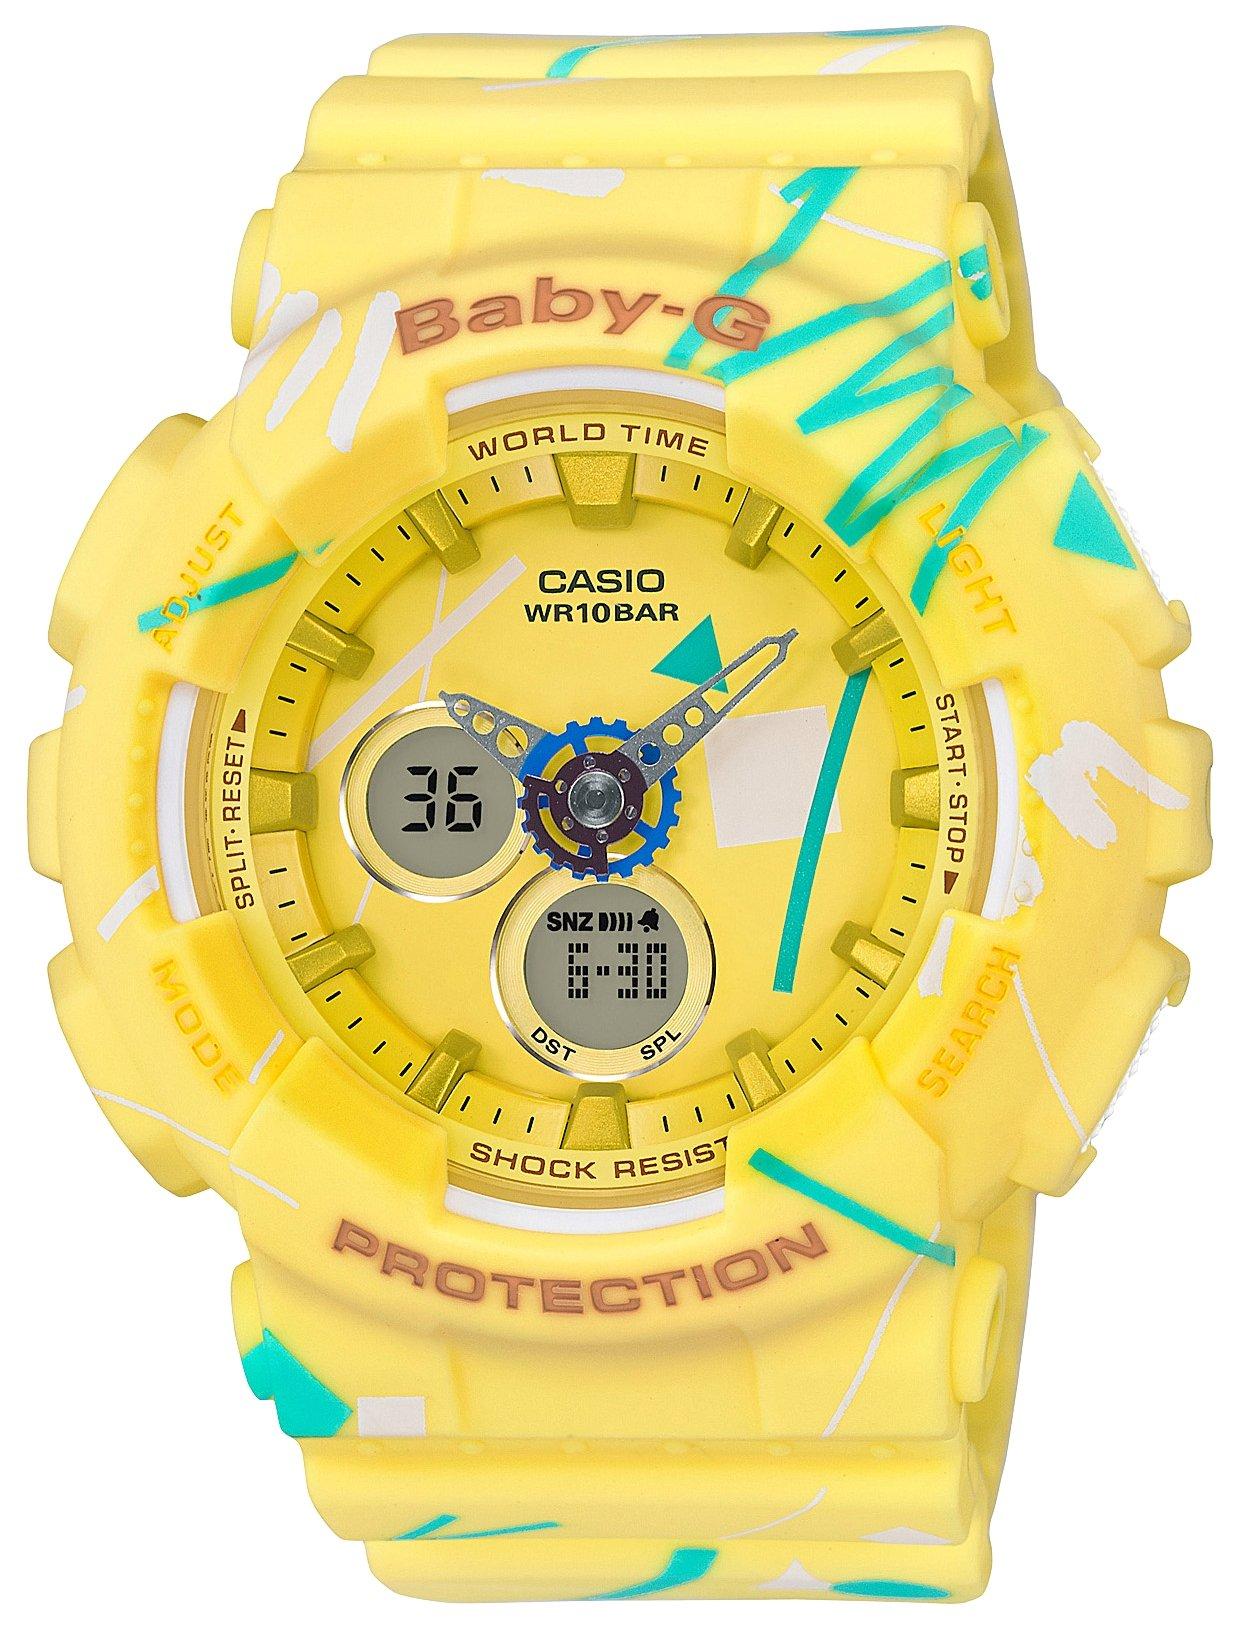 Zakazat.ru Часы наручные женские Casio Baby-G, цвет: желтый, бирюзовый. BA-120SC-9A